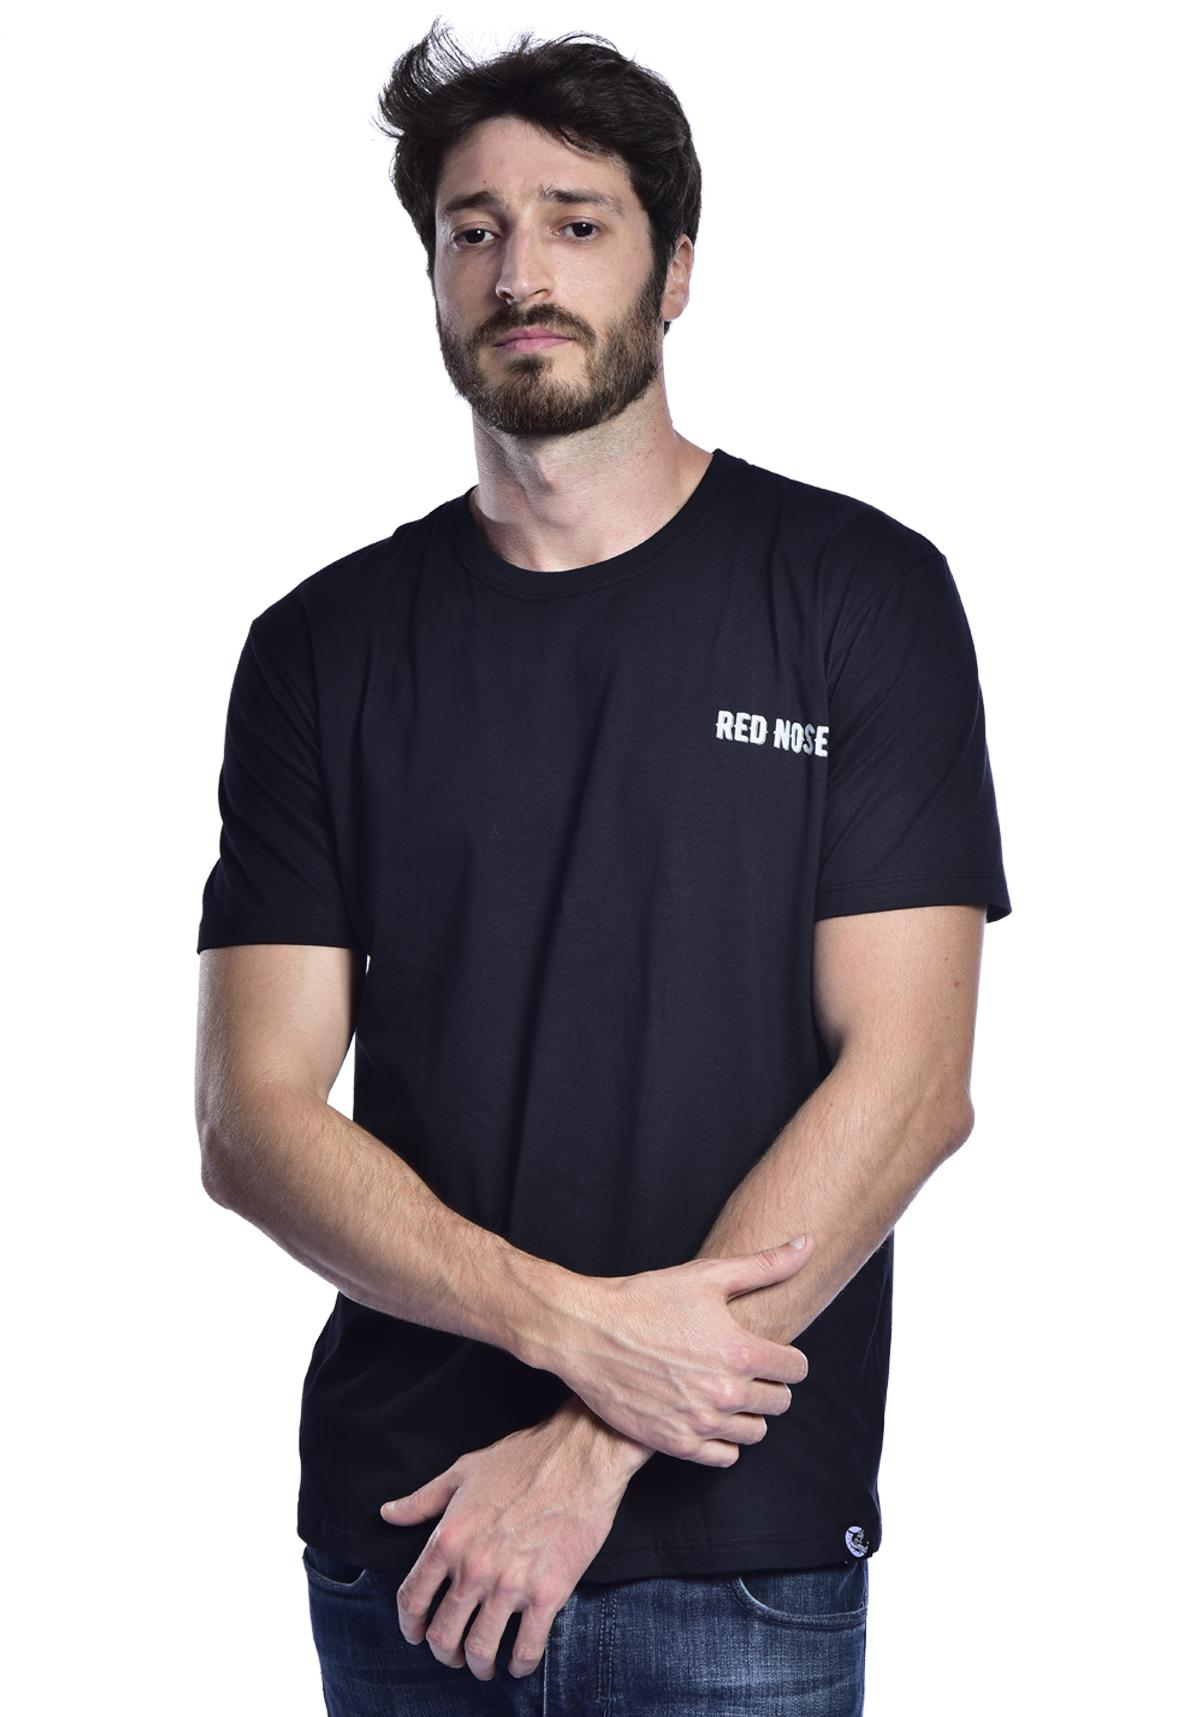 Camiseta Red Nose Caveira Surf - Preto P